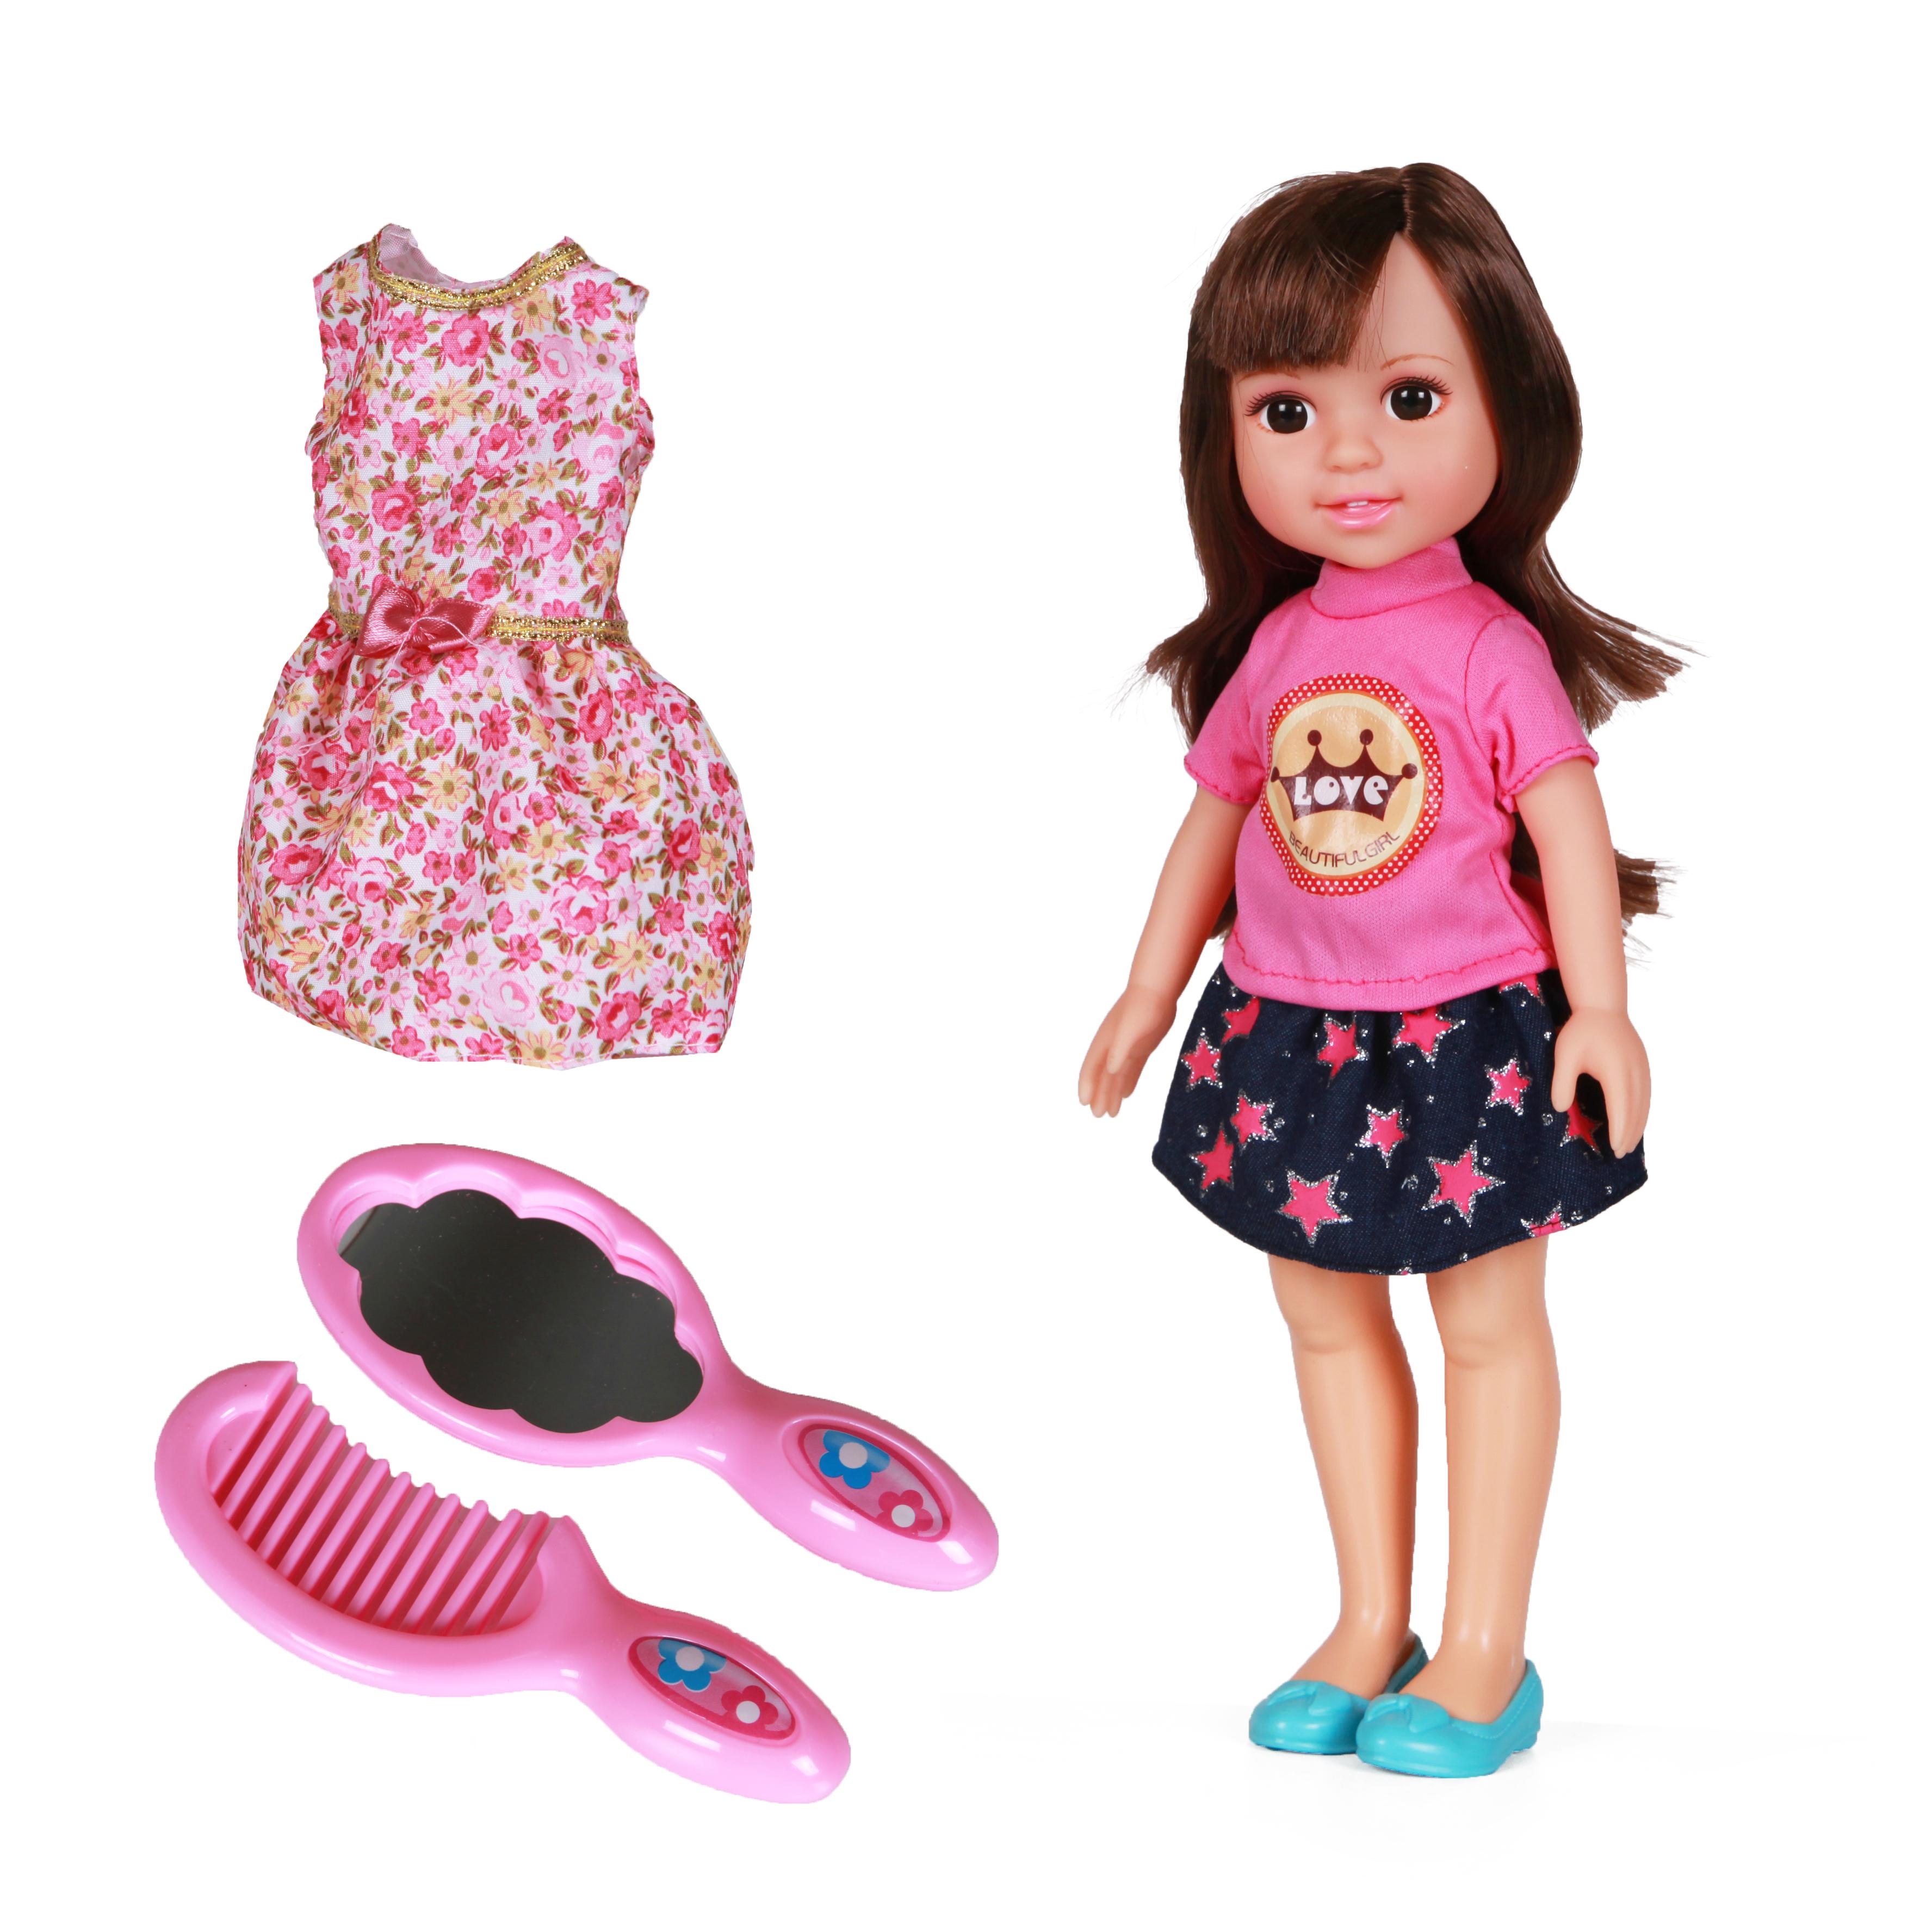 Другие куклы YAKO Кукла Yako Jammy M6313 с аксесс. кукла yako m6289